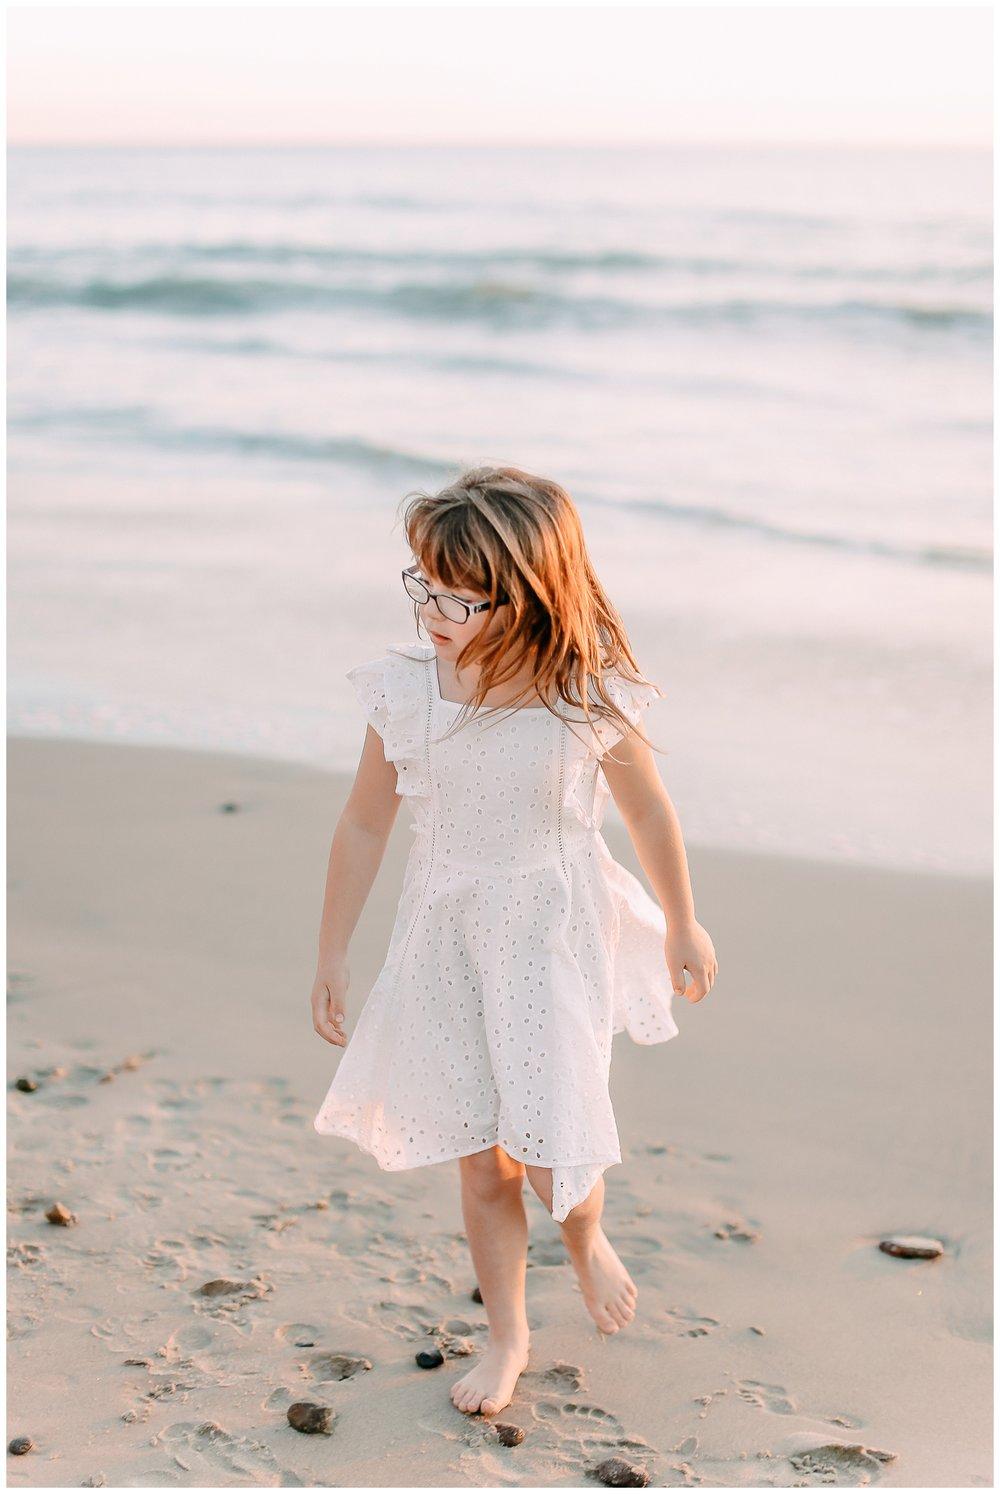 San_clemente_family_session_Orange_county_family_photographer_cori_kleckner_photography_laguna_beach_family_session_0693.jpg